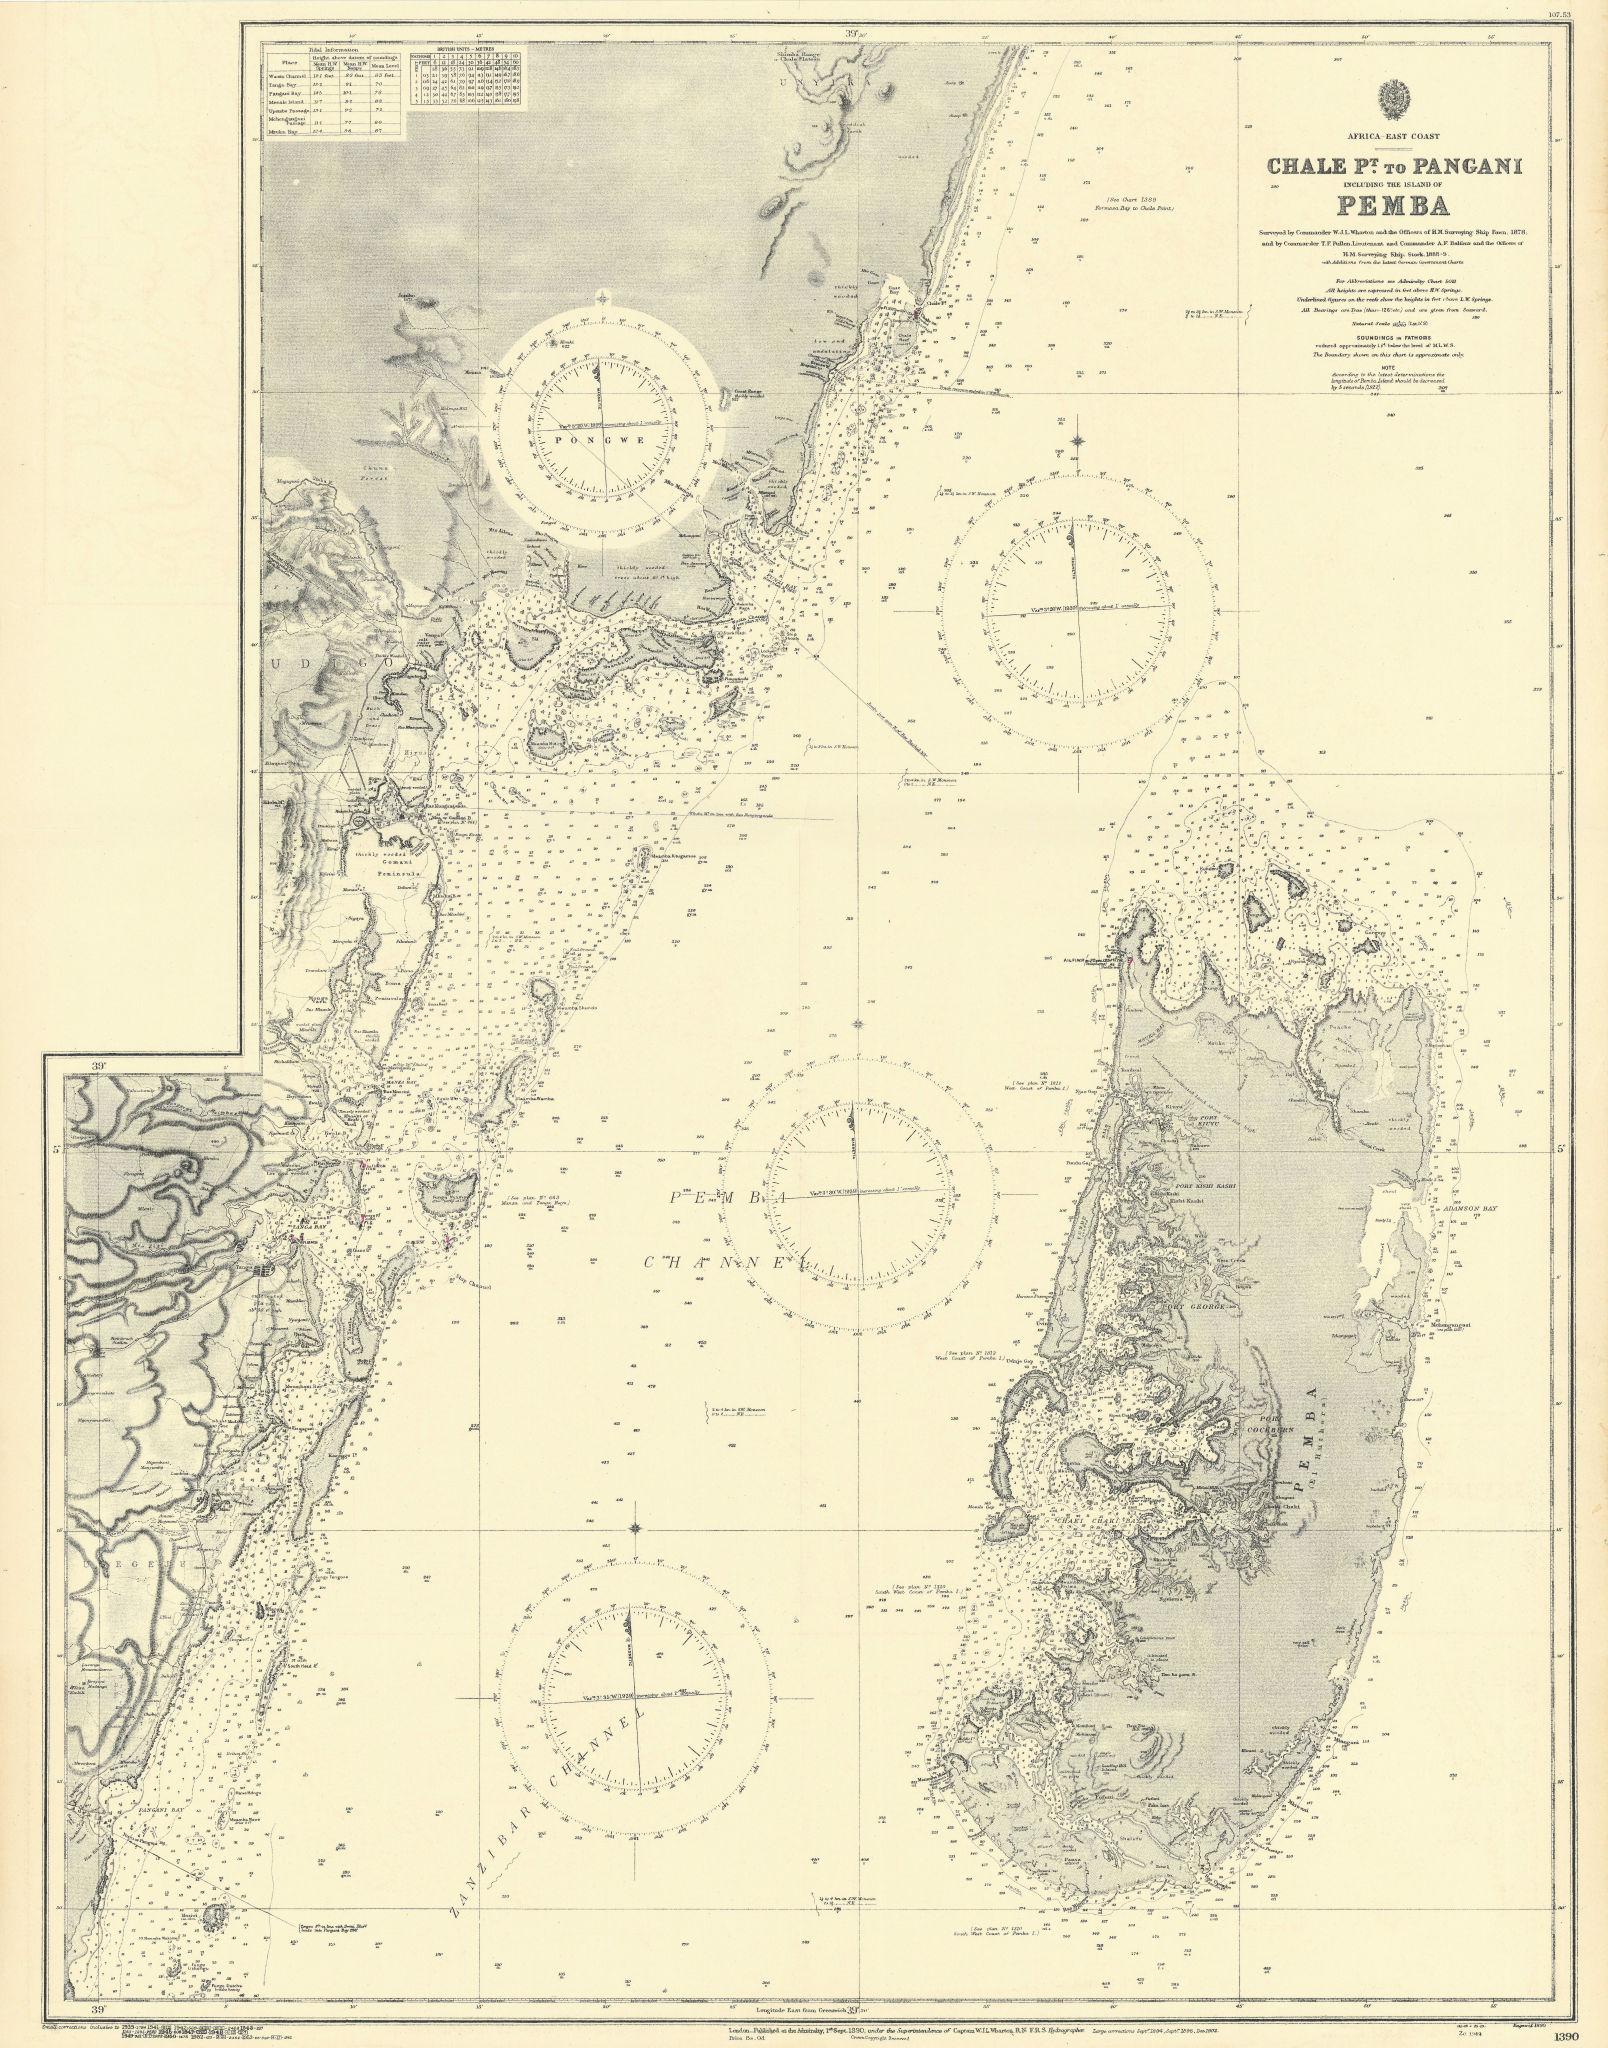 Pemba Island. North Tanzania/S Kenya coast ADMIRALTY sea chart 1890 (1953) map